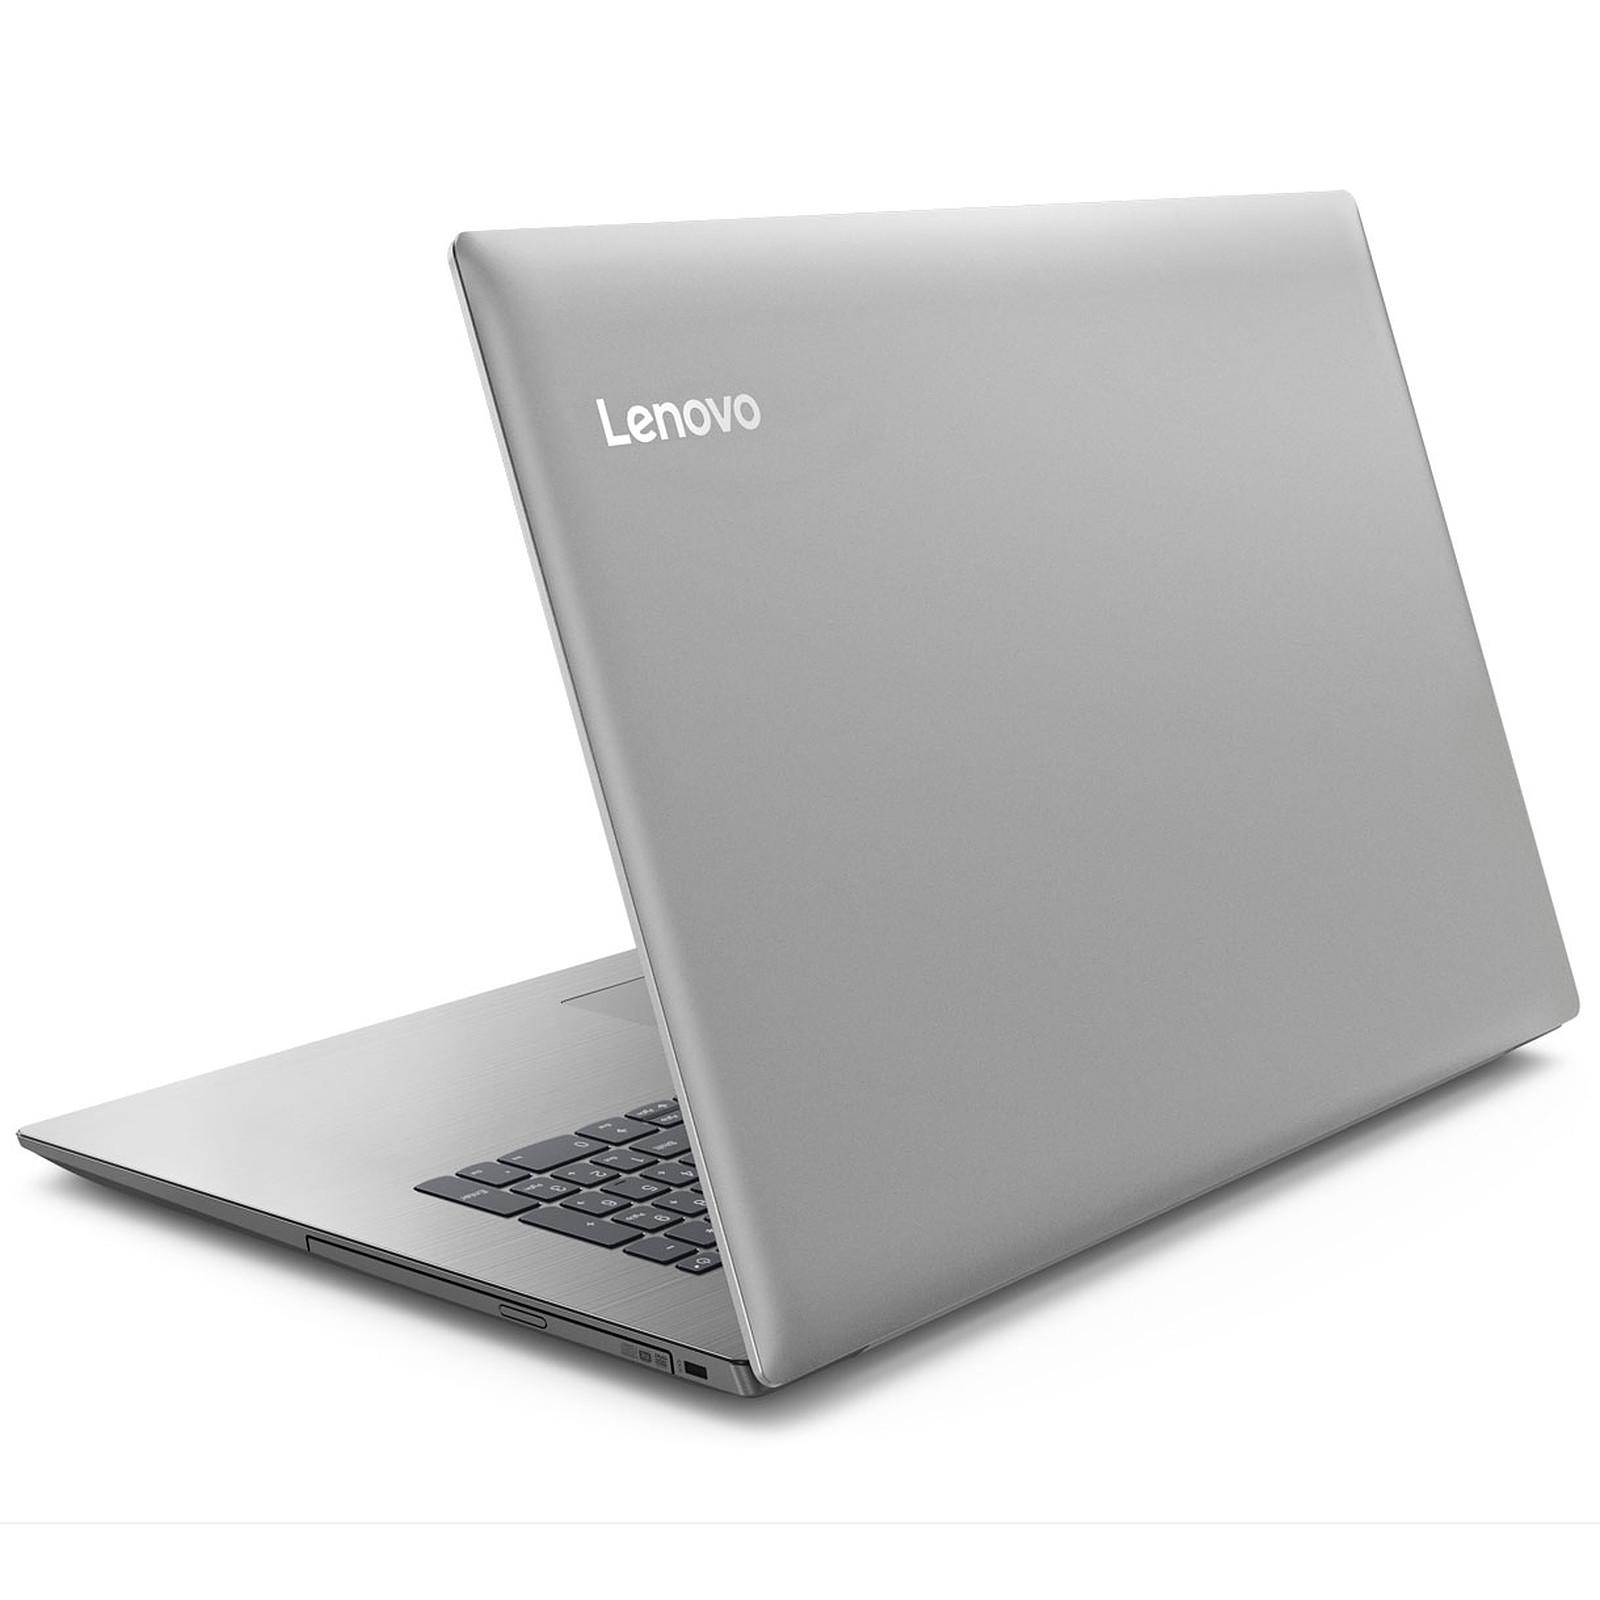 Lenovo Ideapad 330 17ikb 81dm003dfr Pc Portable Lenovo